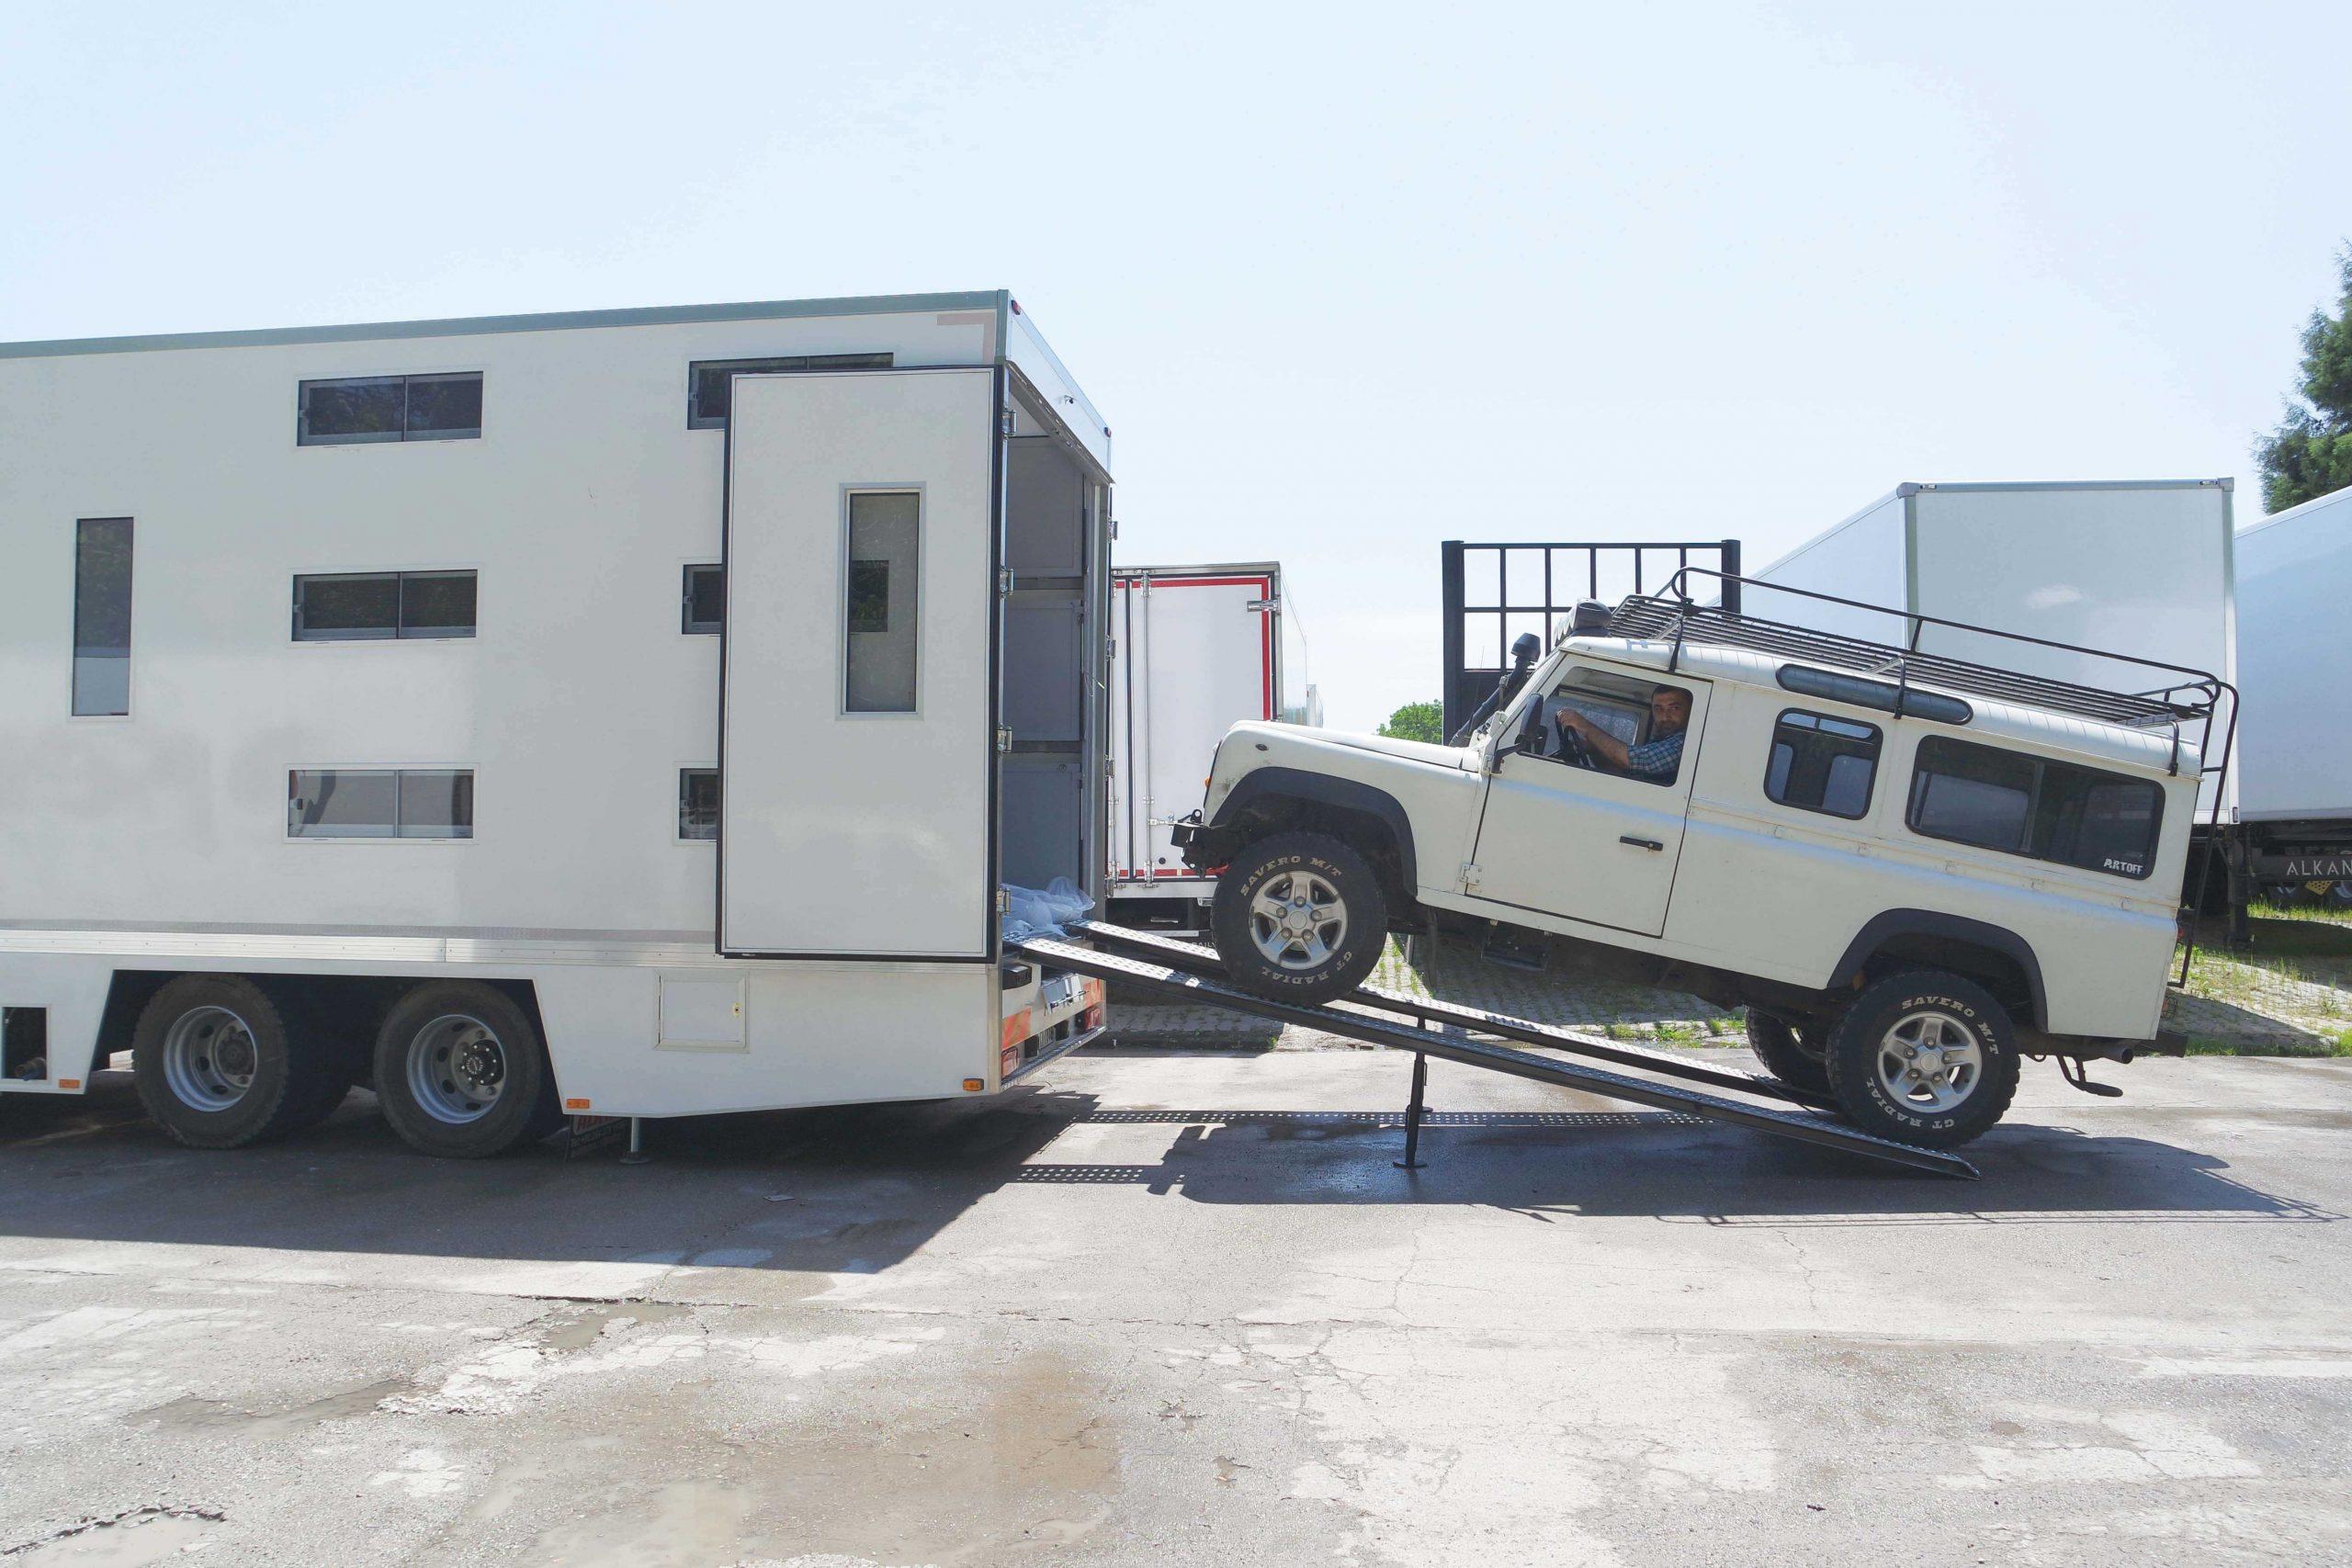 mobil saha araci 3